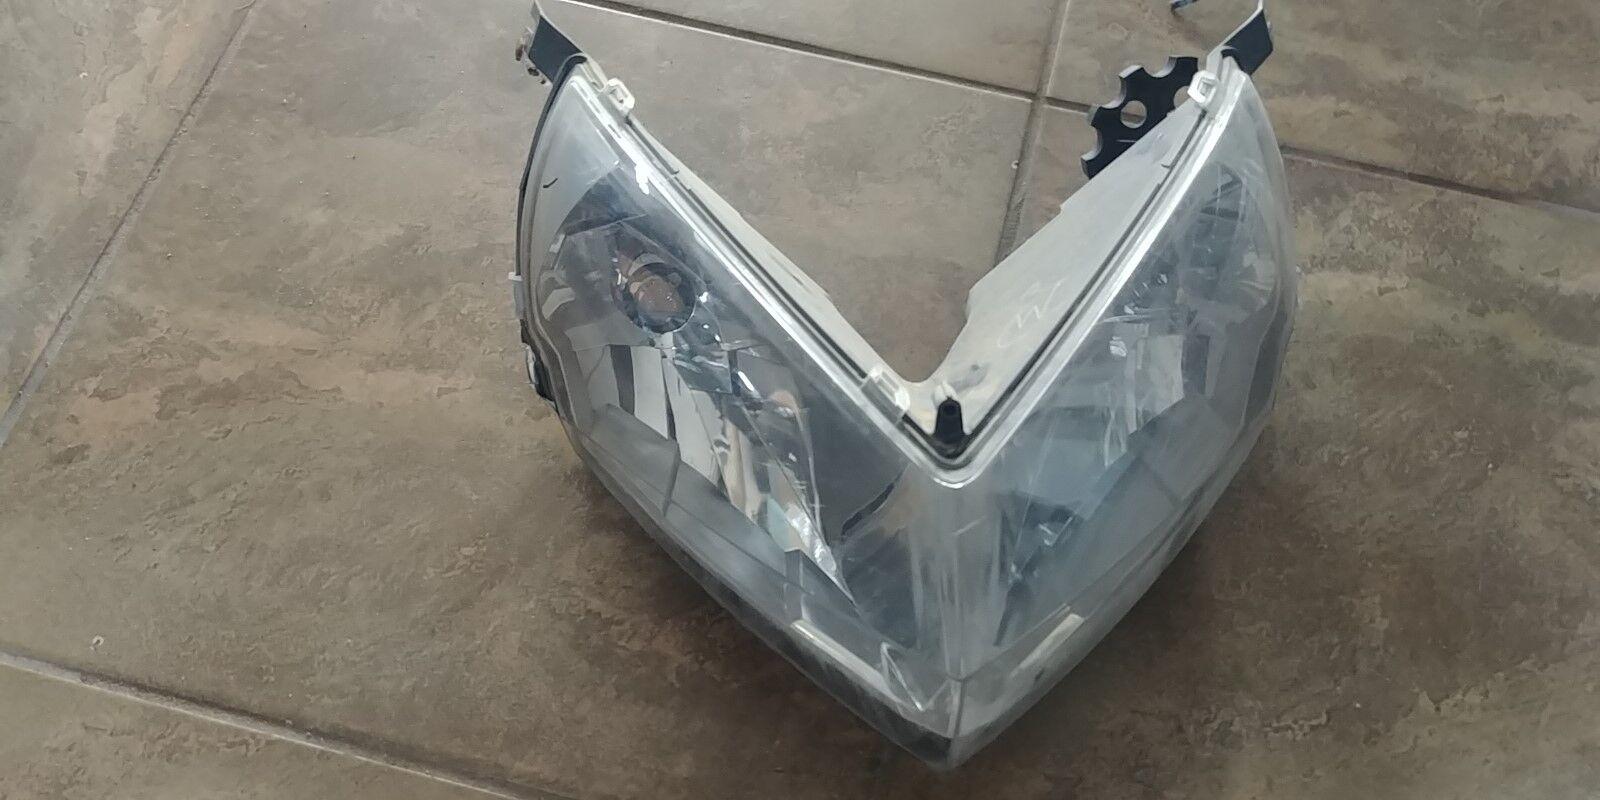 10 11 12 13 14 Polaris Rush 800 RMK Switchback 600 Headlight Assembly